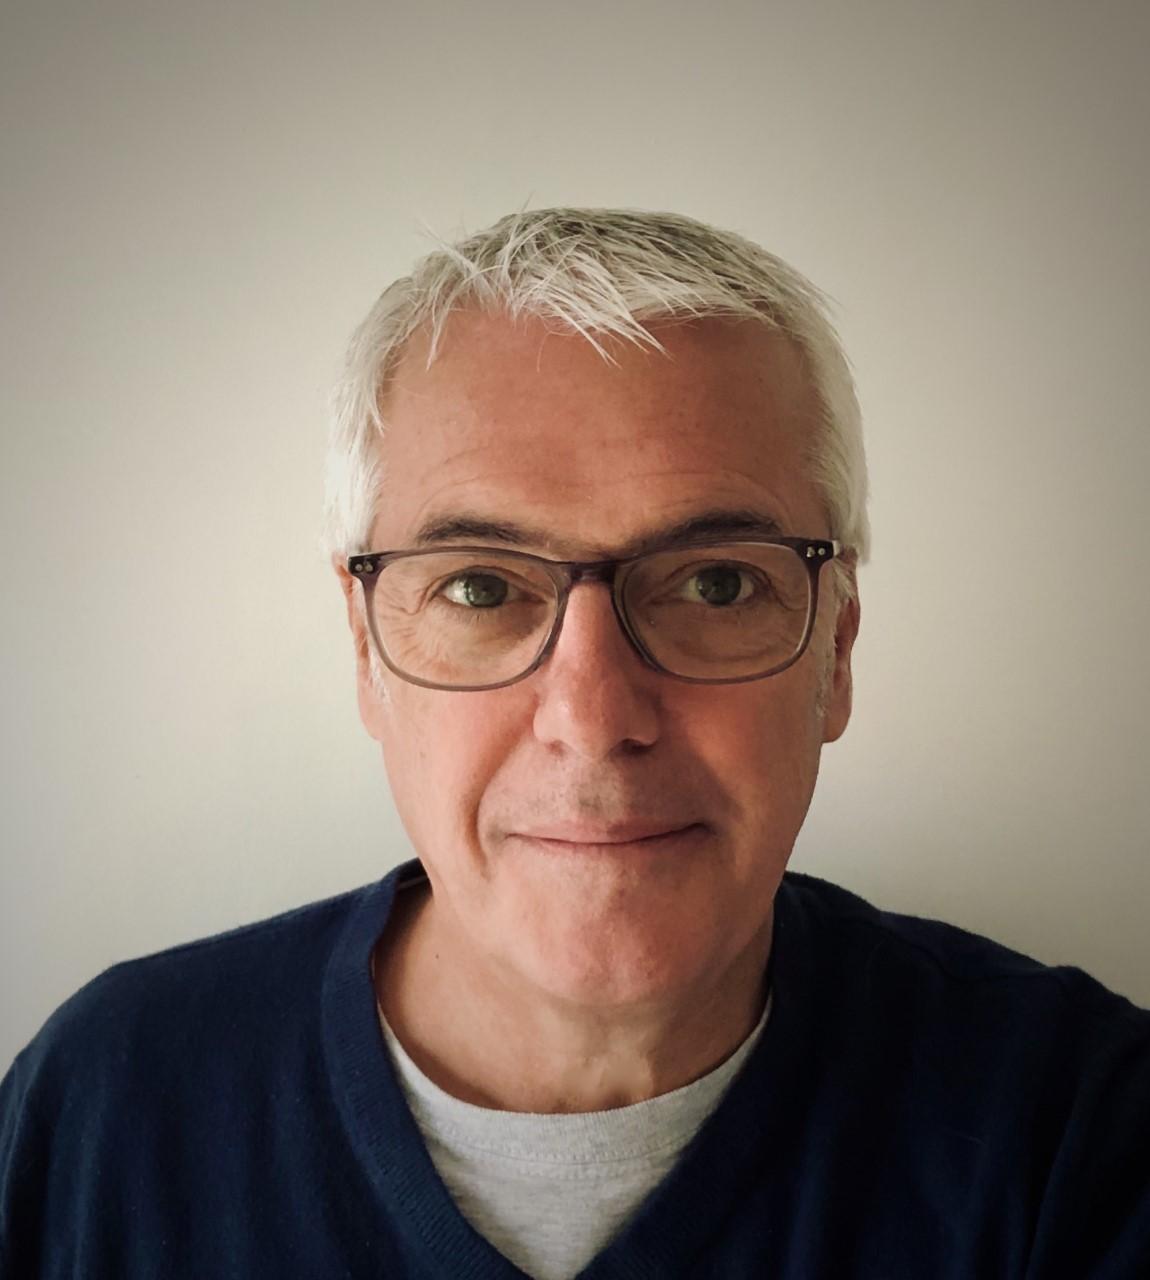 Michel Bams